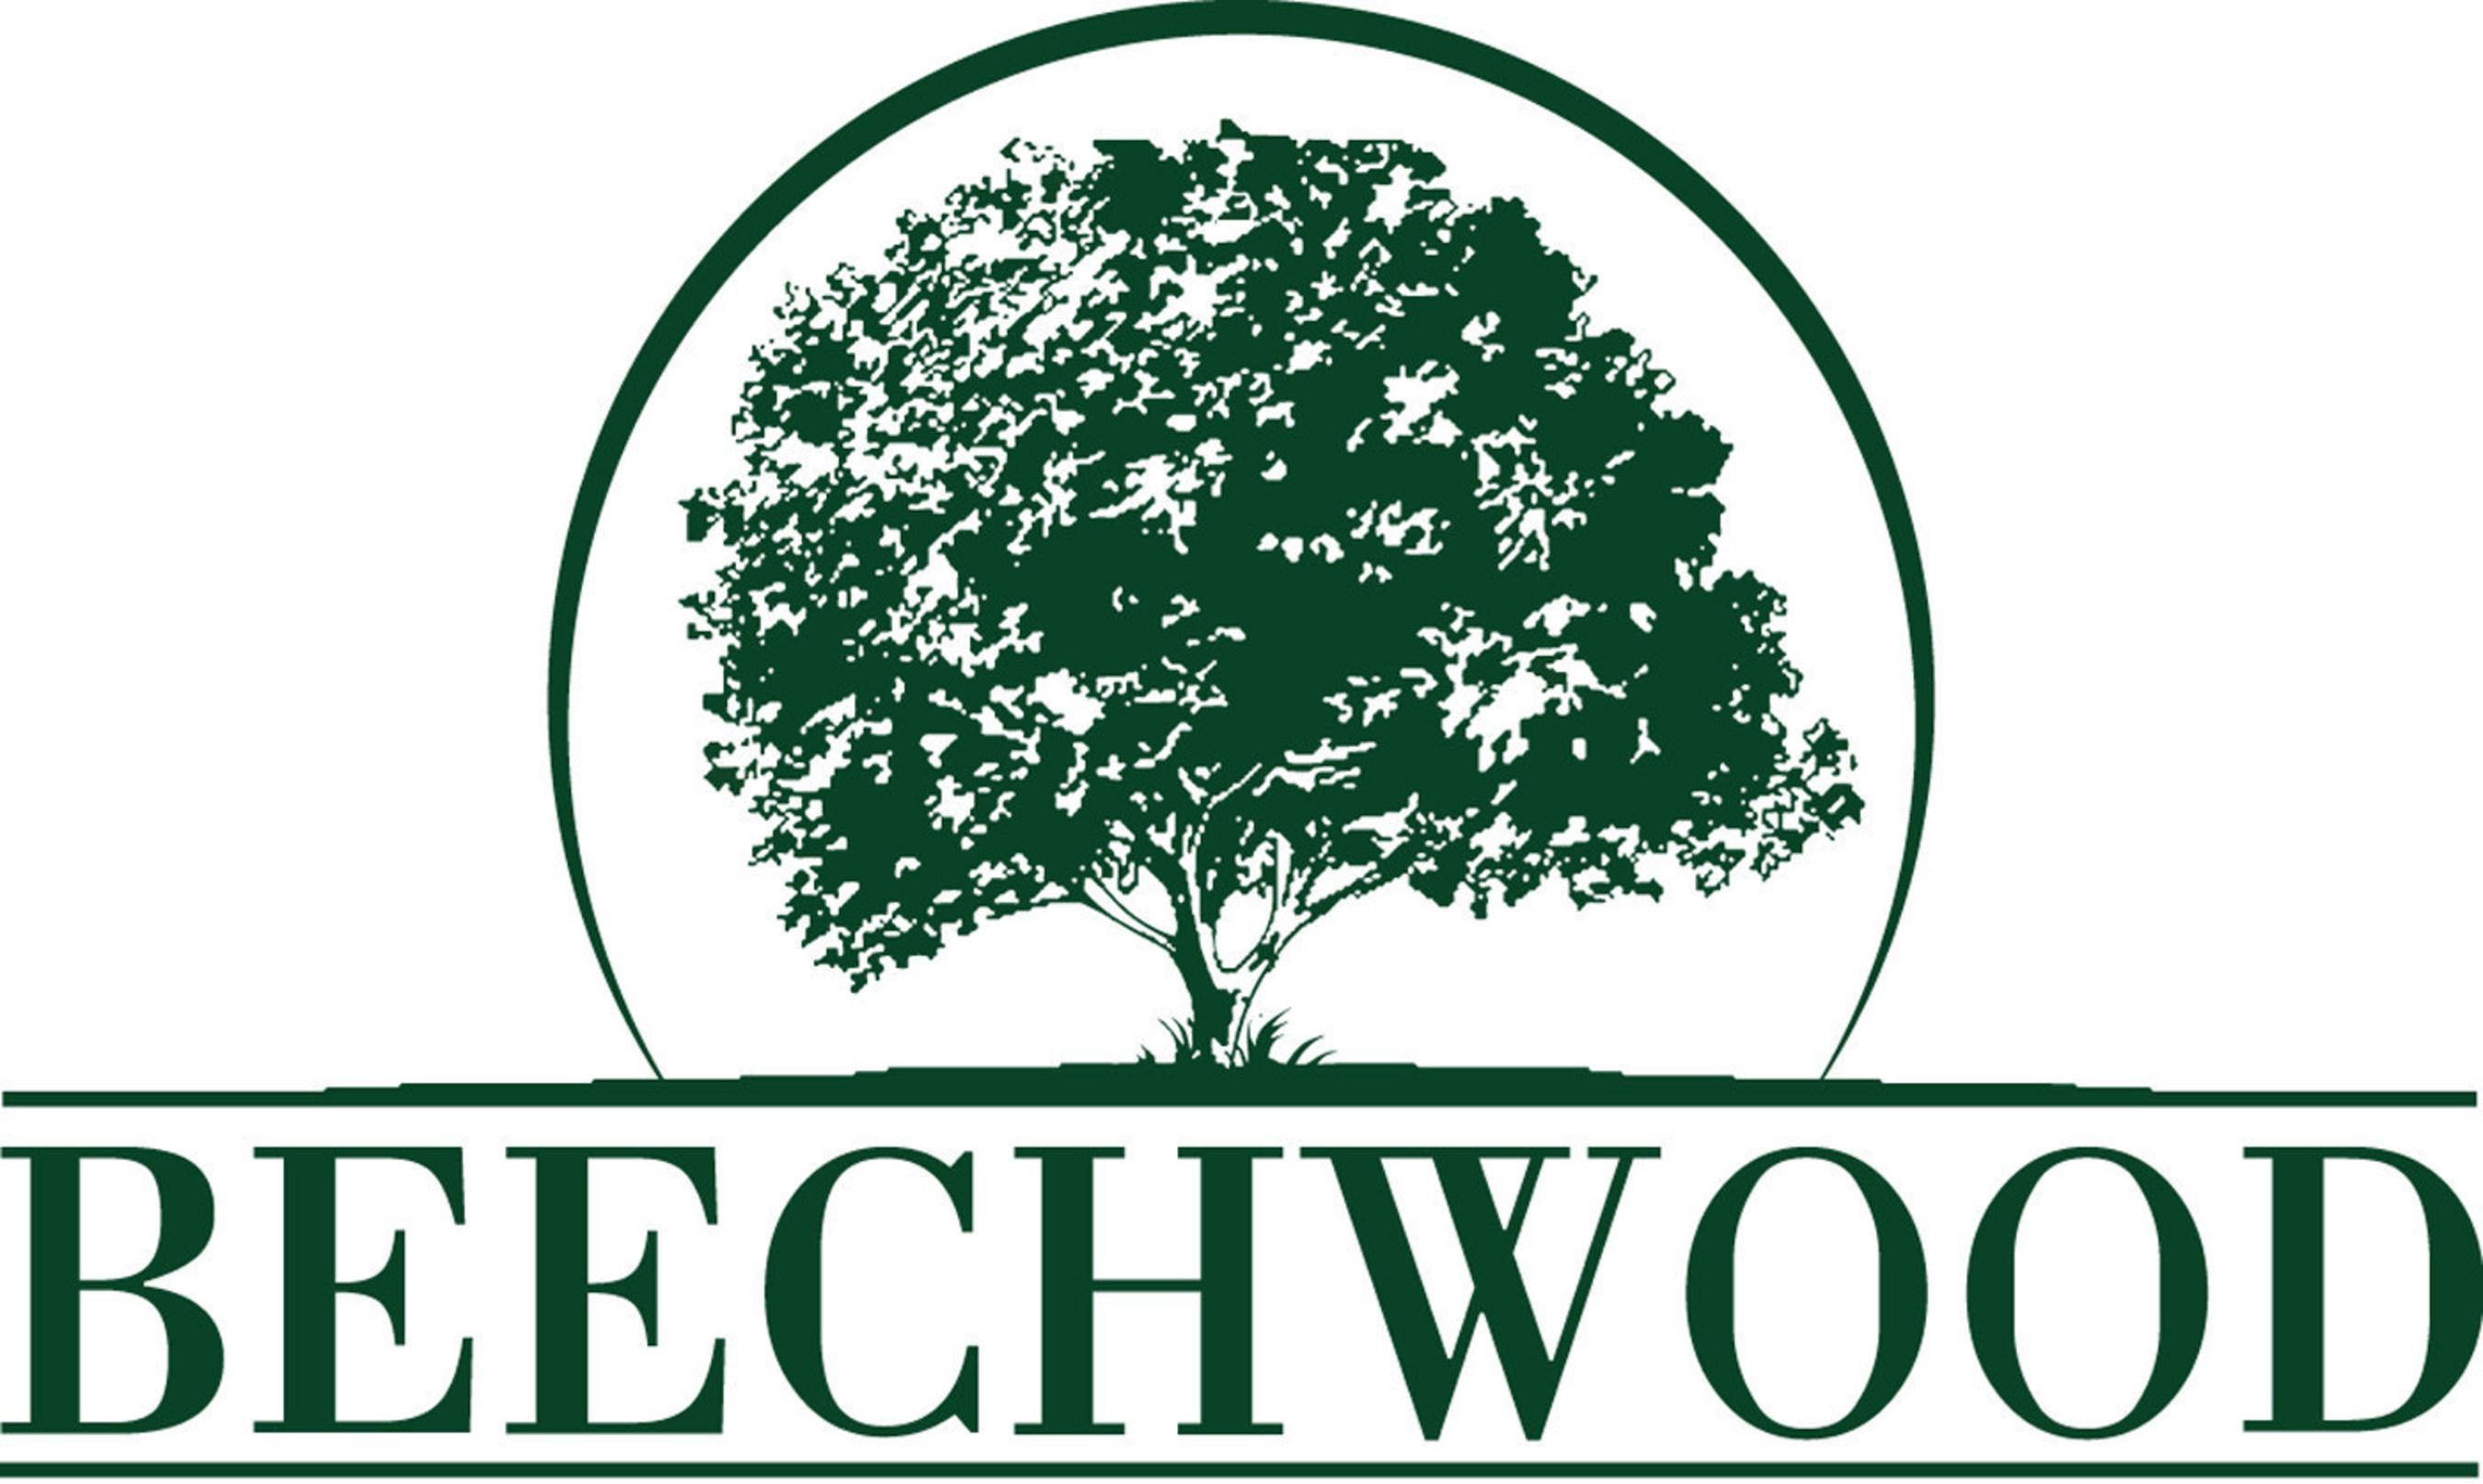 Beechwood przejmuje Old Mutual Bermuda